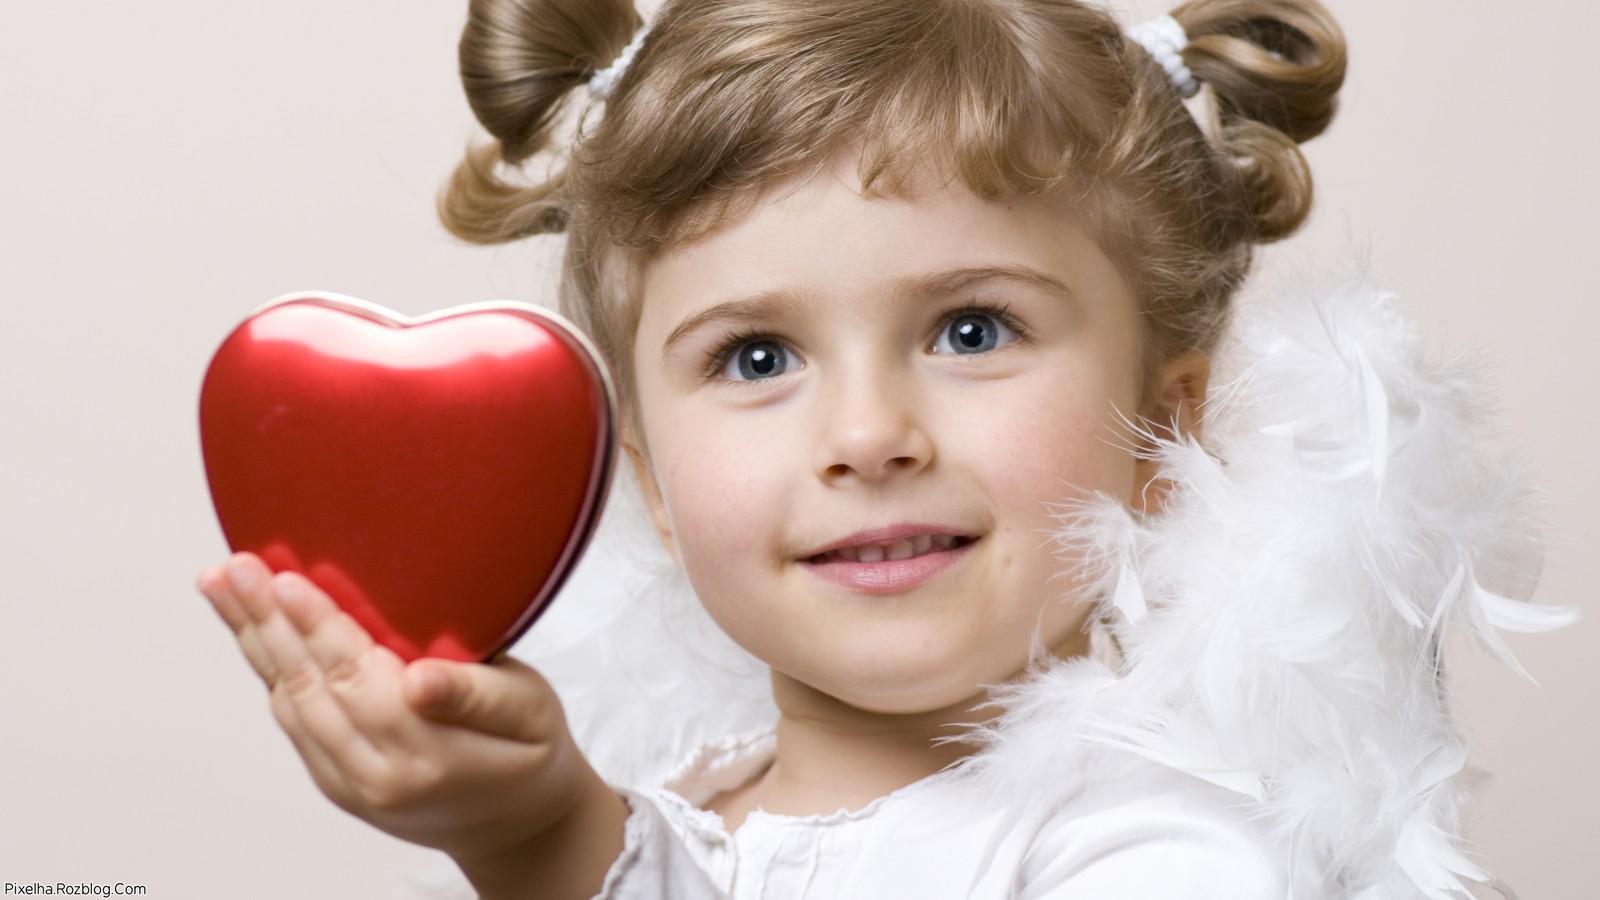 دختربچه و قلب سرخ